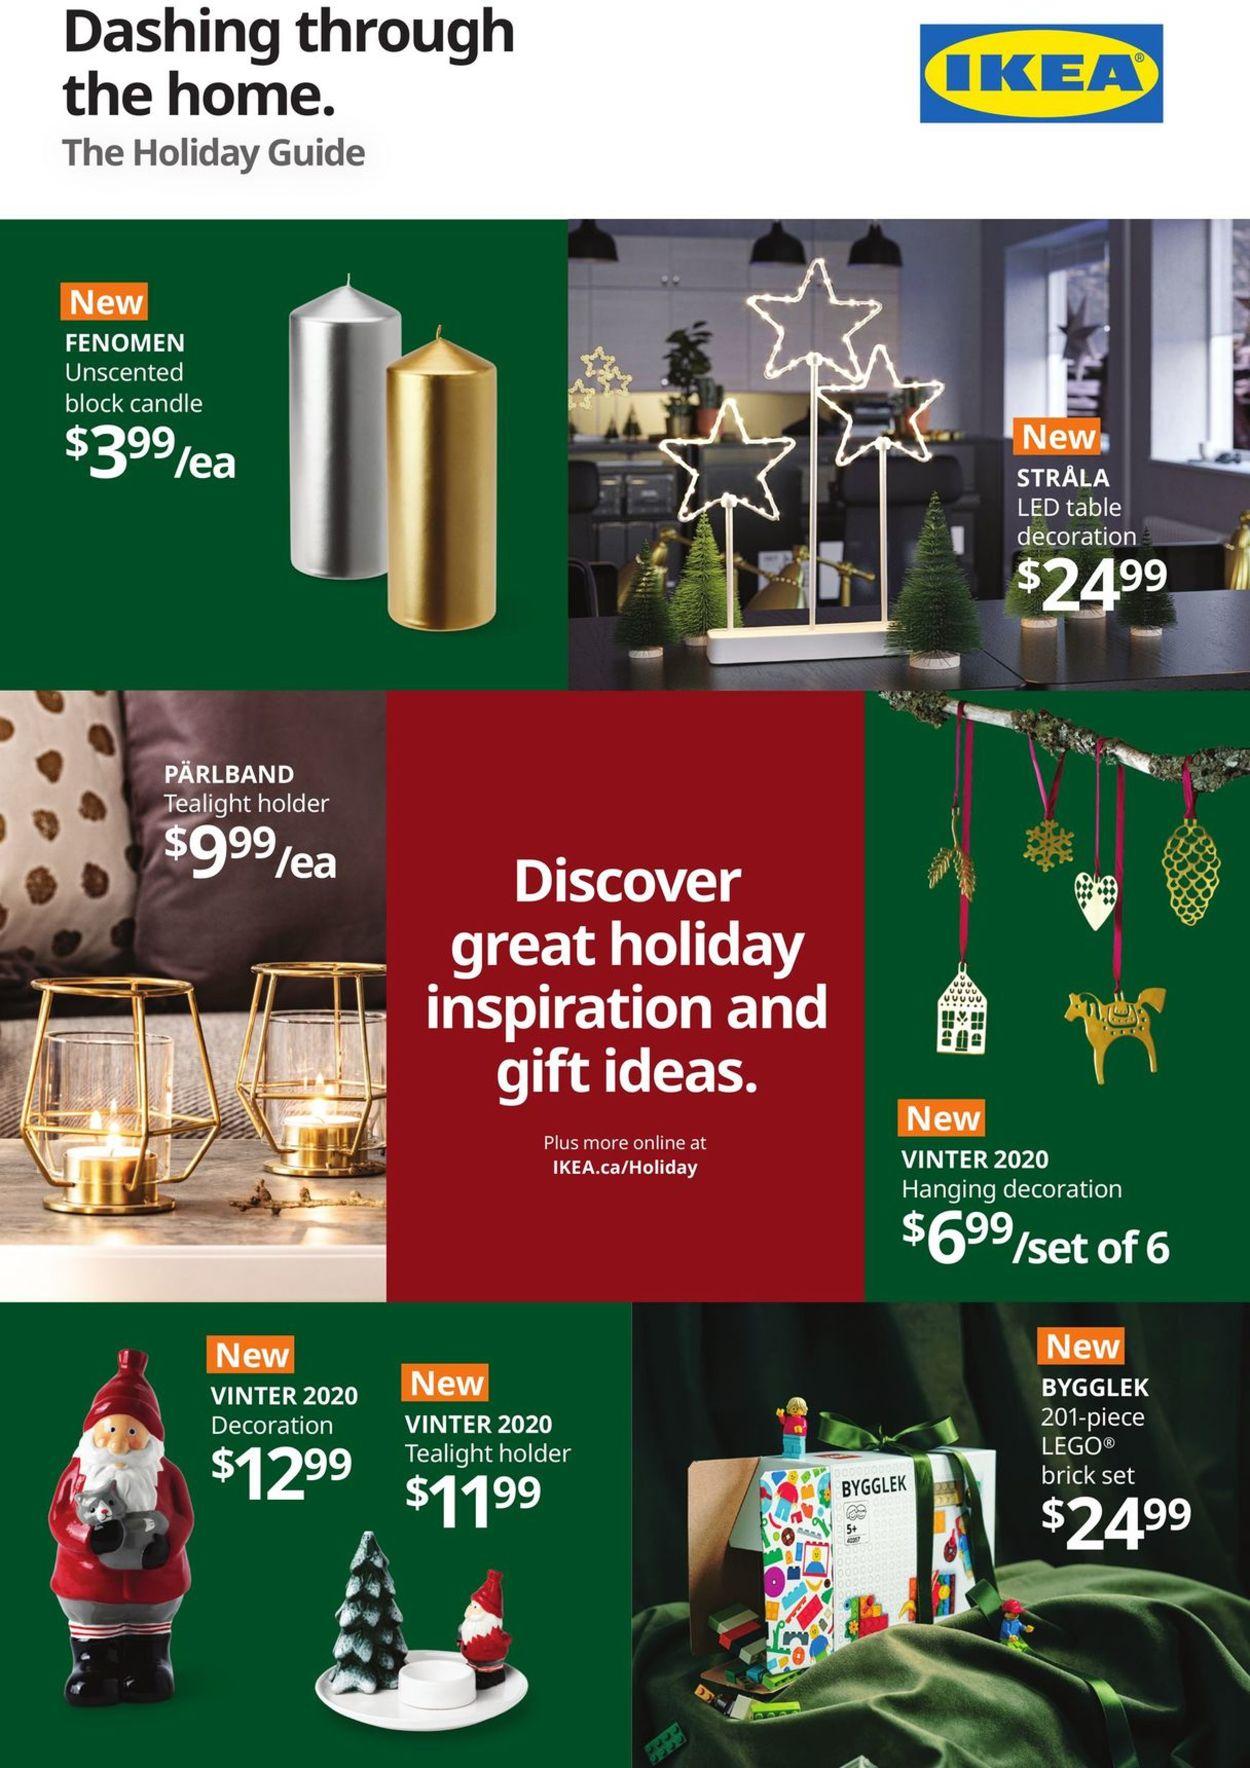 IKEA - Holiday 2020 Flyer - 11/12-11/25/2020